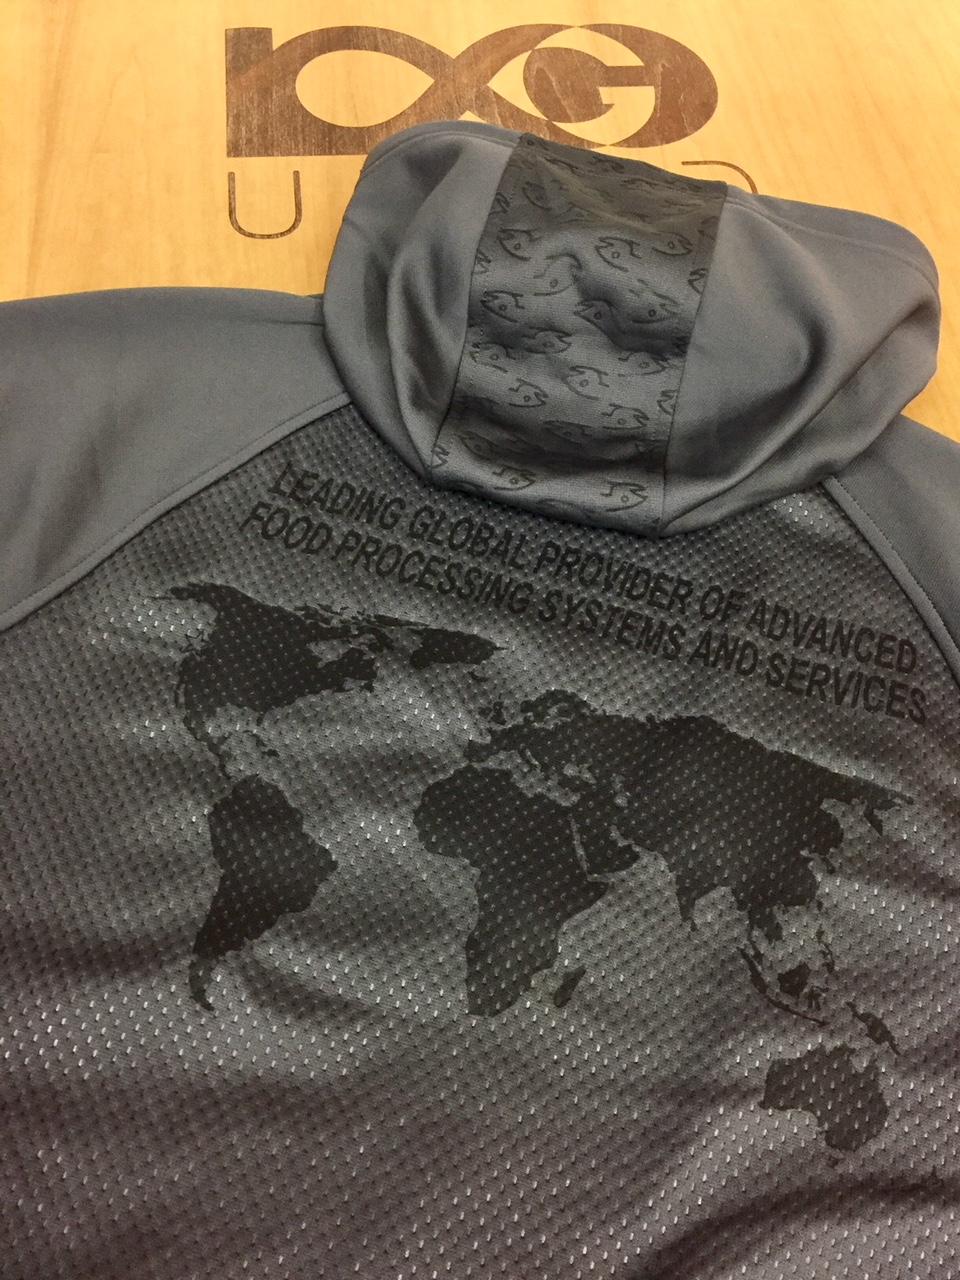 logounltd_laser_etching_embroidery_screen_printing_corporate_apparel_uniform_custom_tshirts_uniforms_dye_sublimation_kirkland_bellevue_seattle_redmond_branded_merchandise_promotional_products_logo_untd (88).jpg